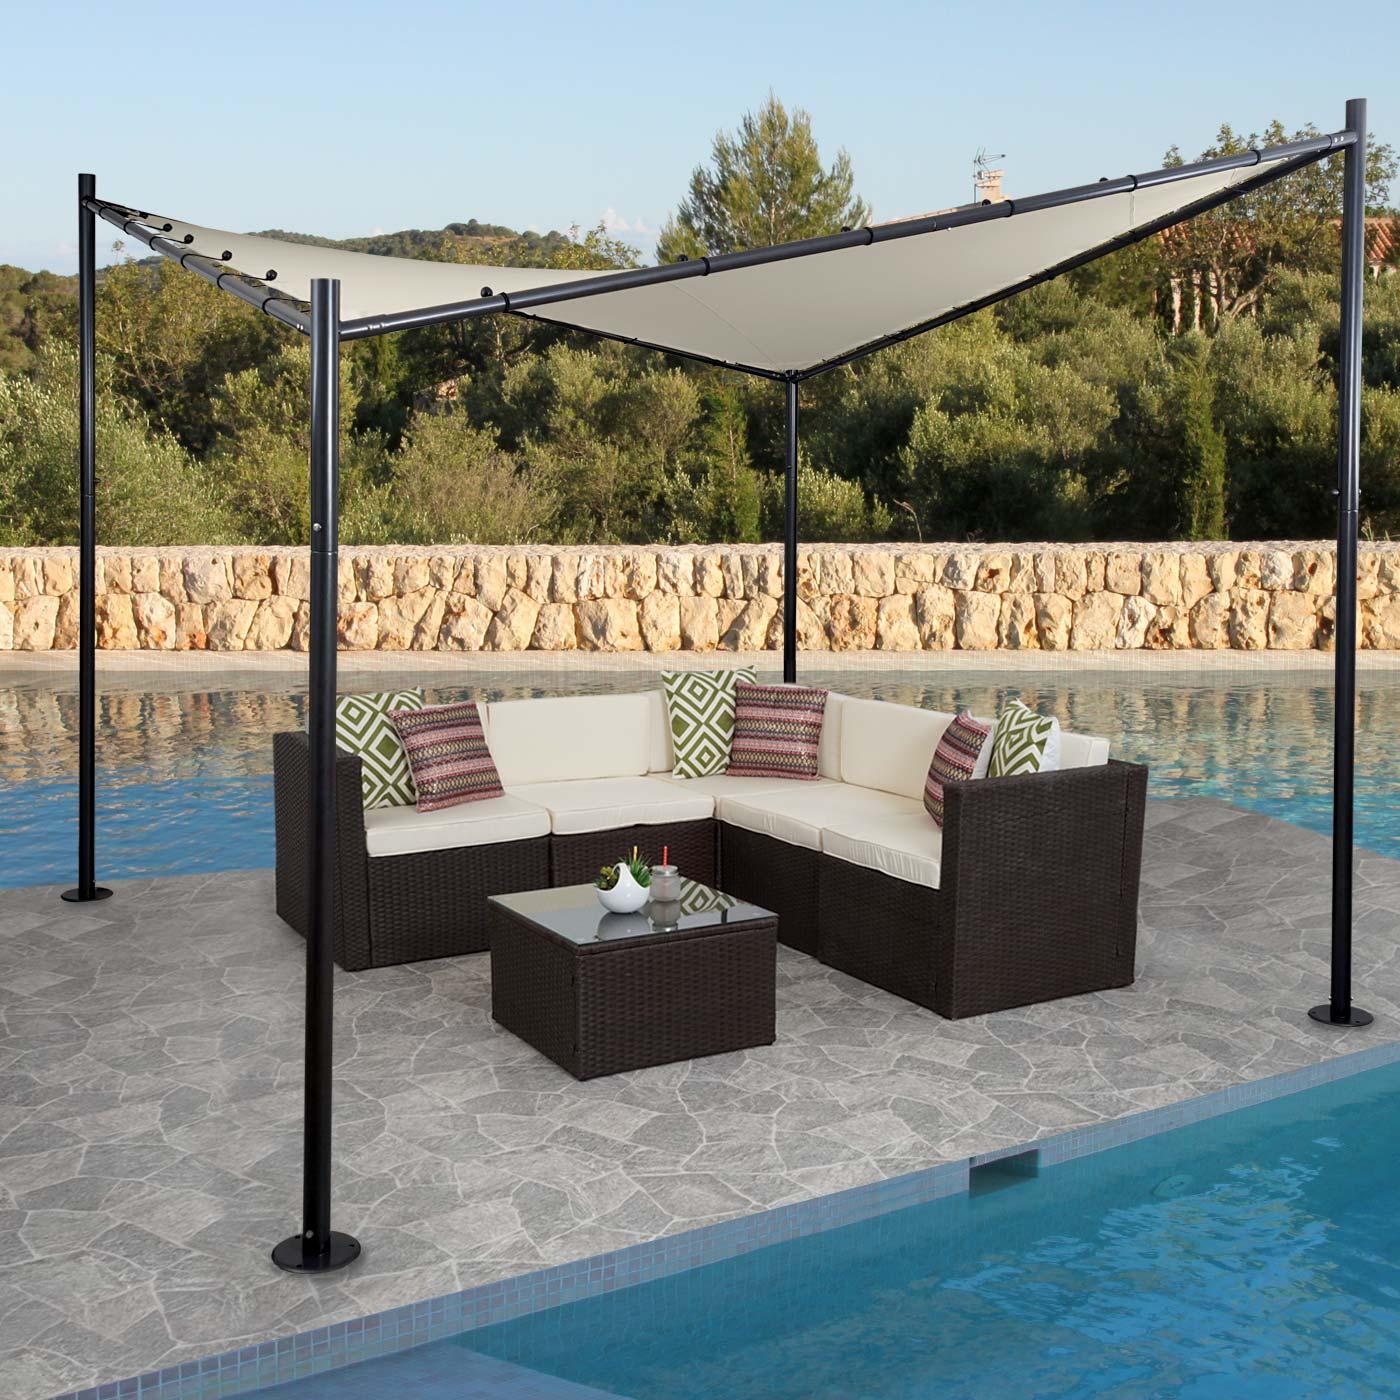 pergola hwc a41 garten pavillon sonnensegel stabiles. Black Bedroom Furniture Sets. Home Design Ideas